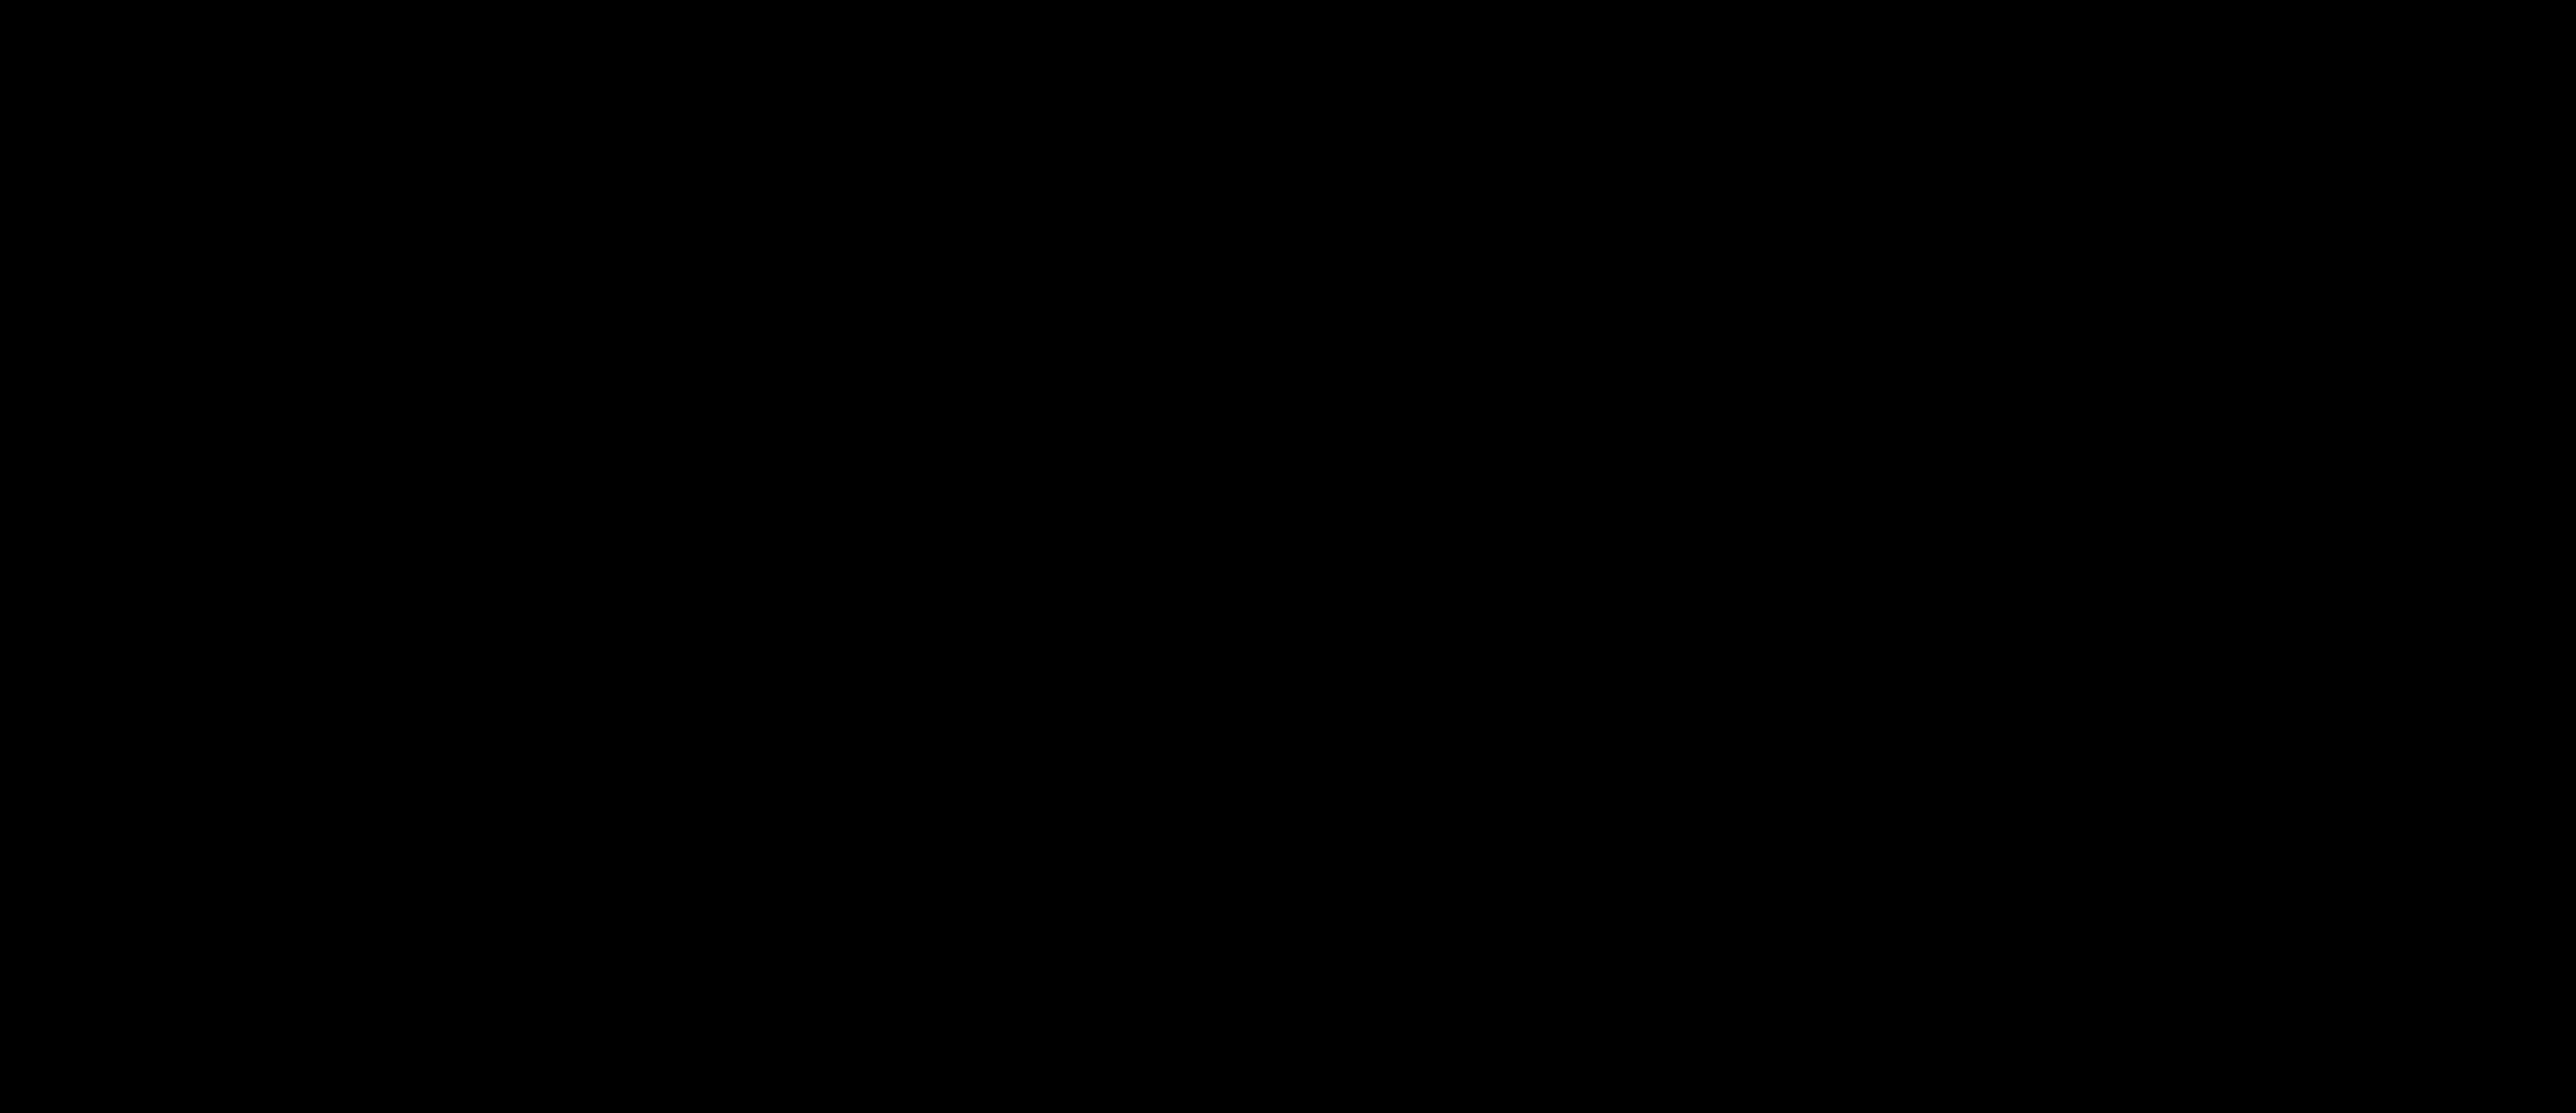 Placa raven